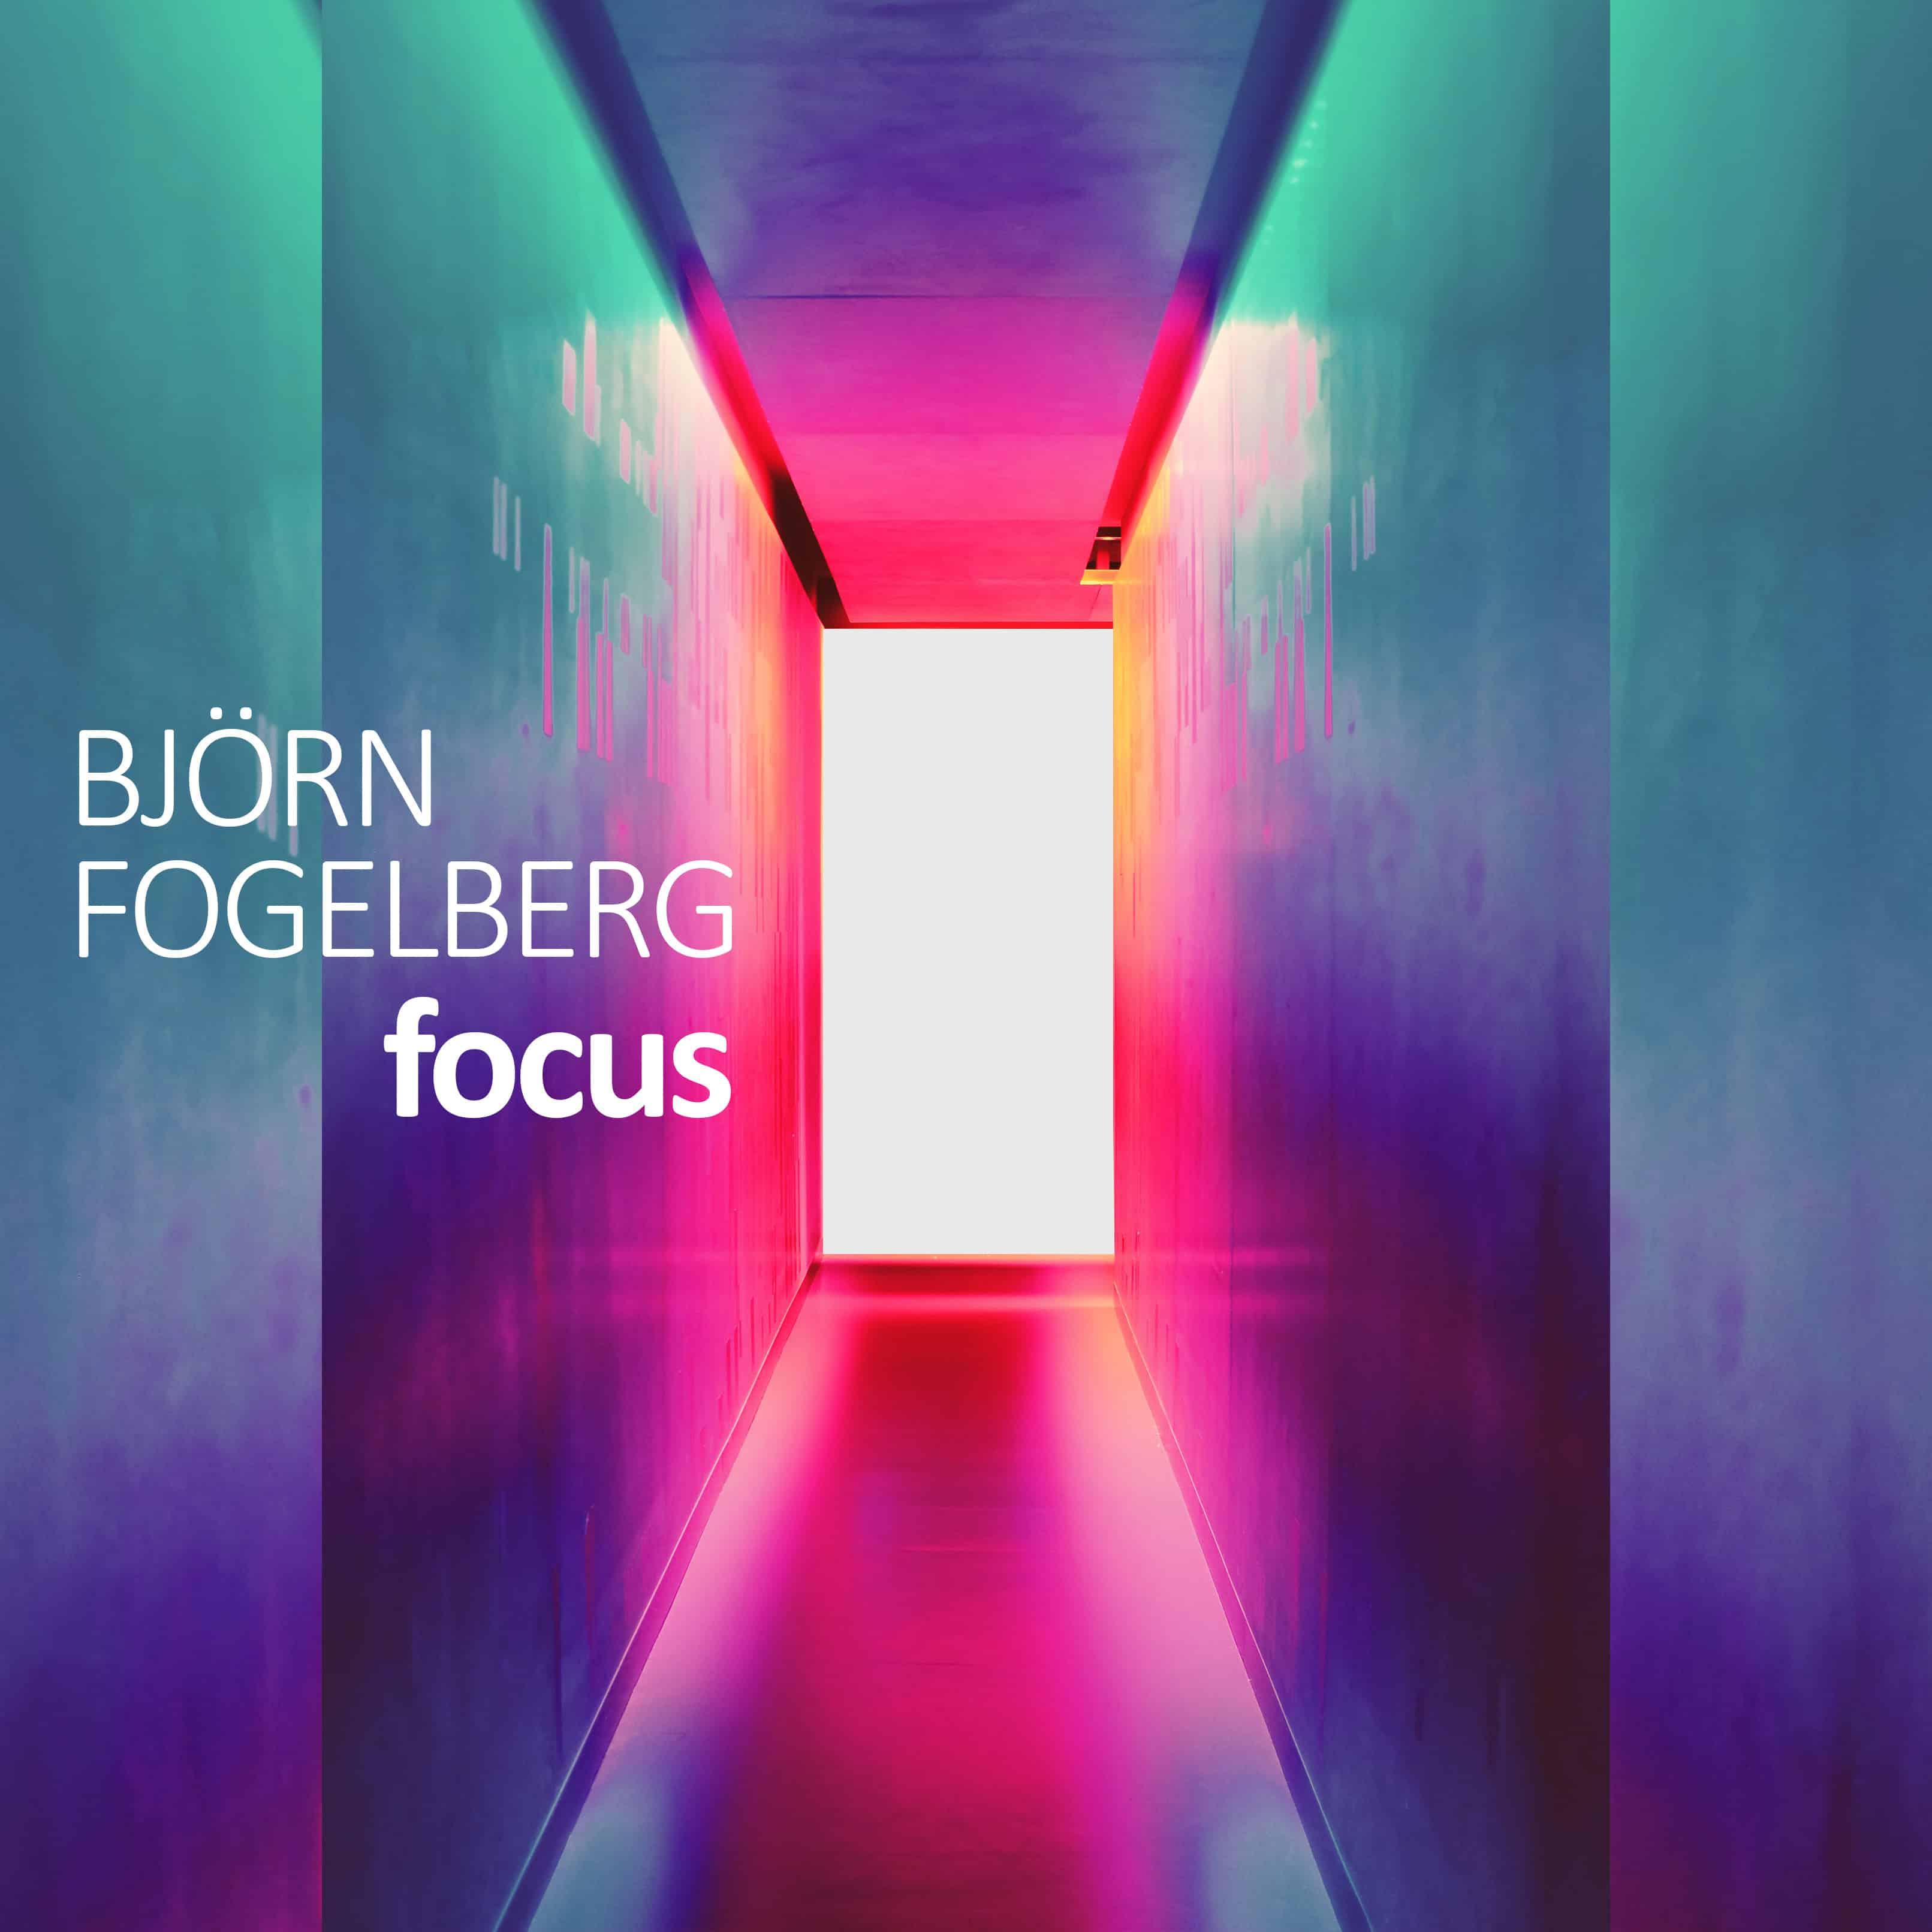 Björn Fogelberg - Focus